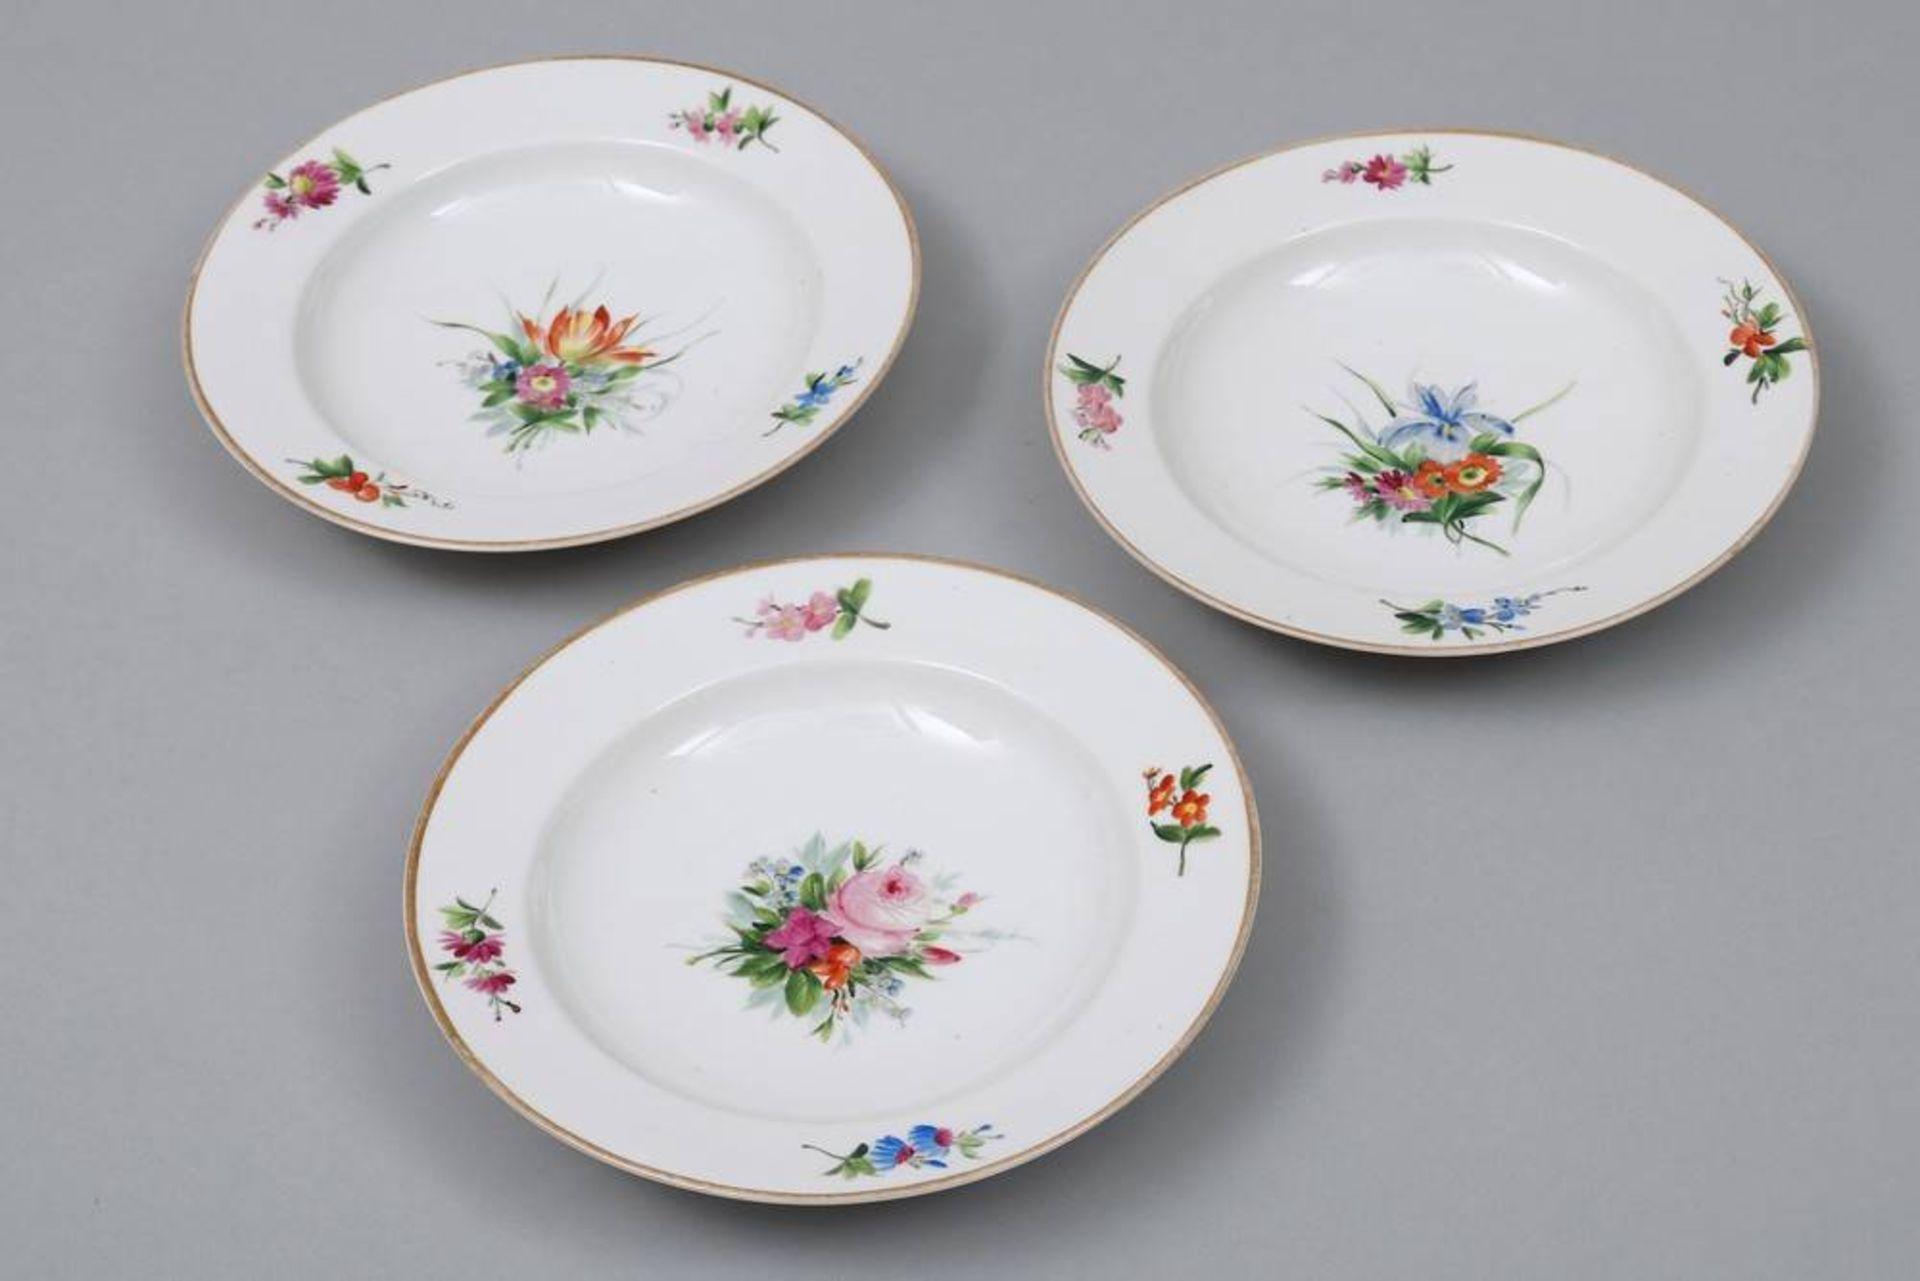 3 Suppenteller, Royal Kopenhagen, 19.Jh. - Image 2 of 4